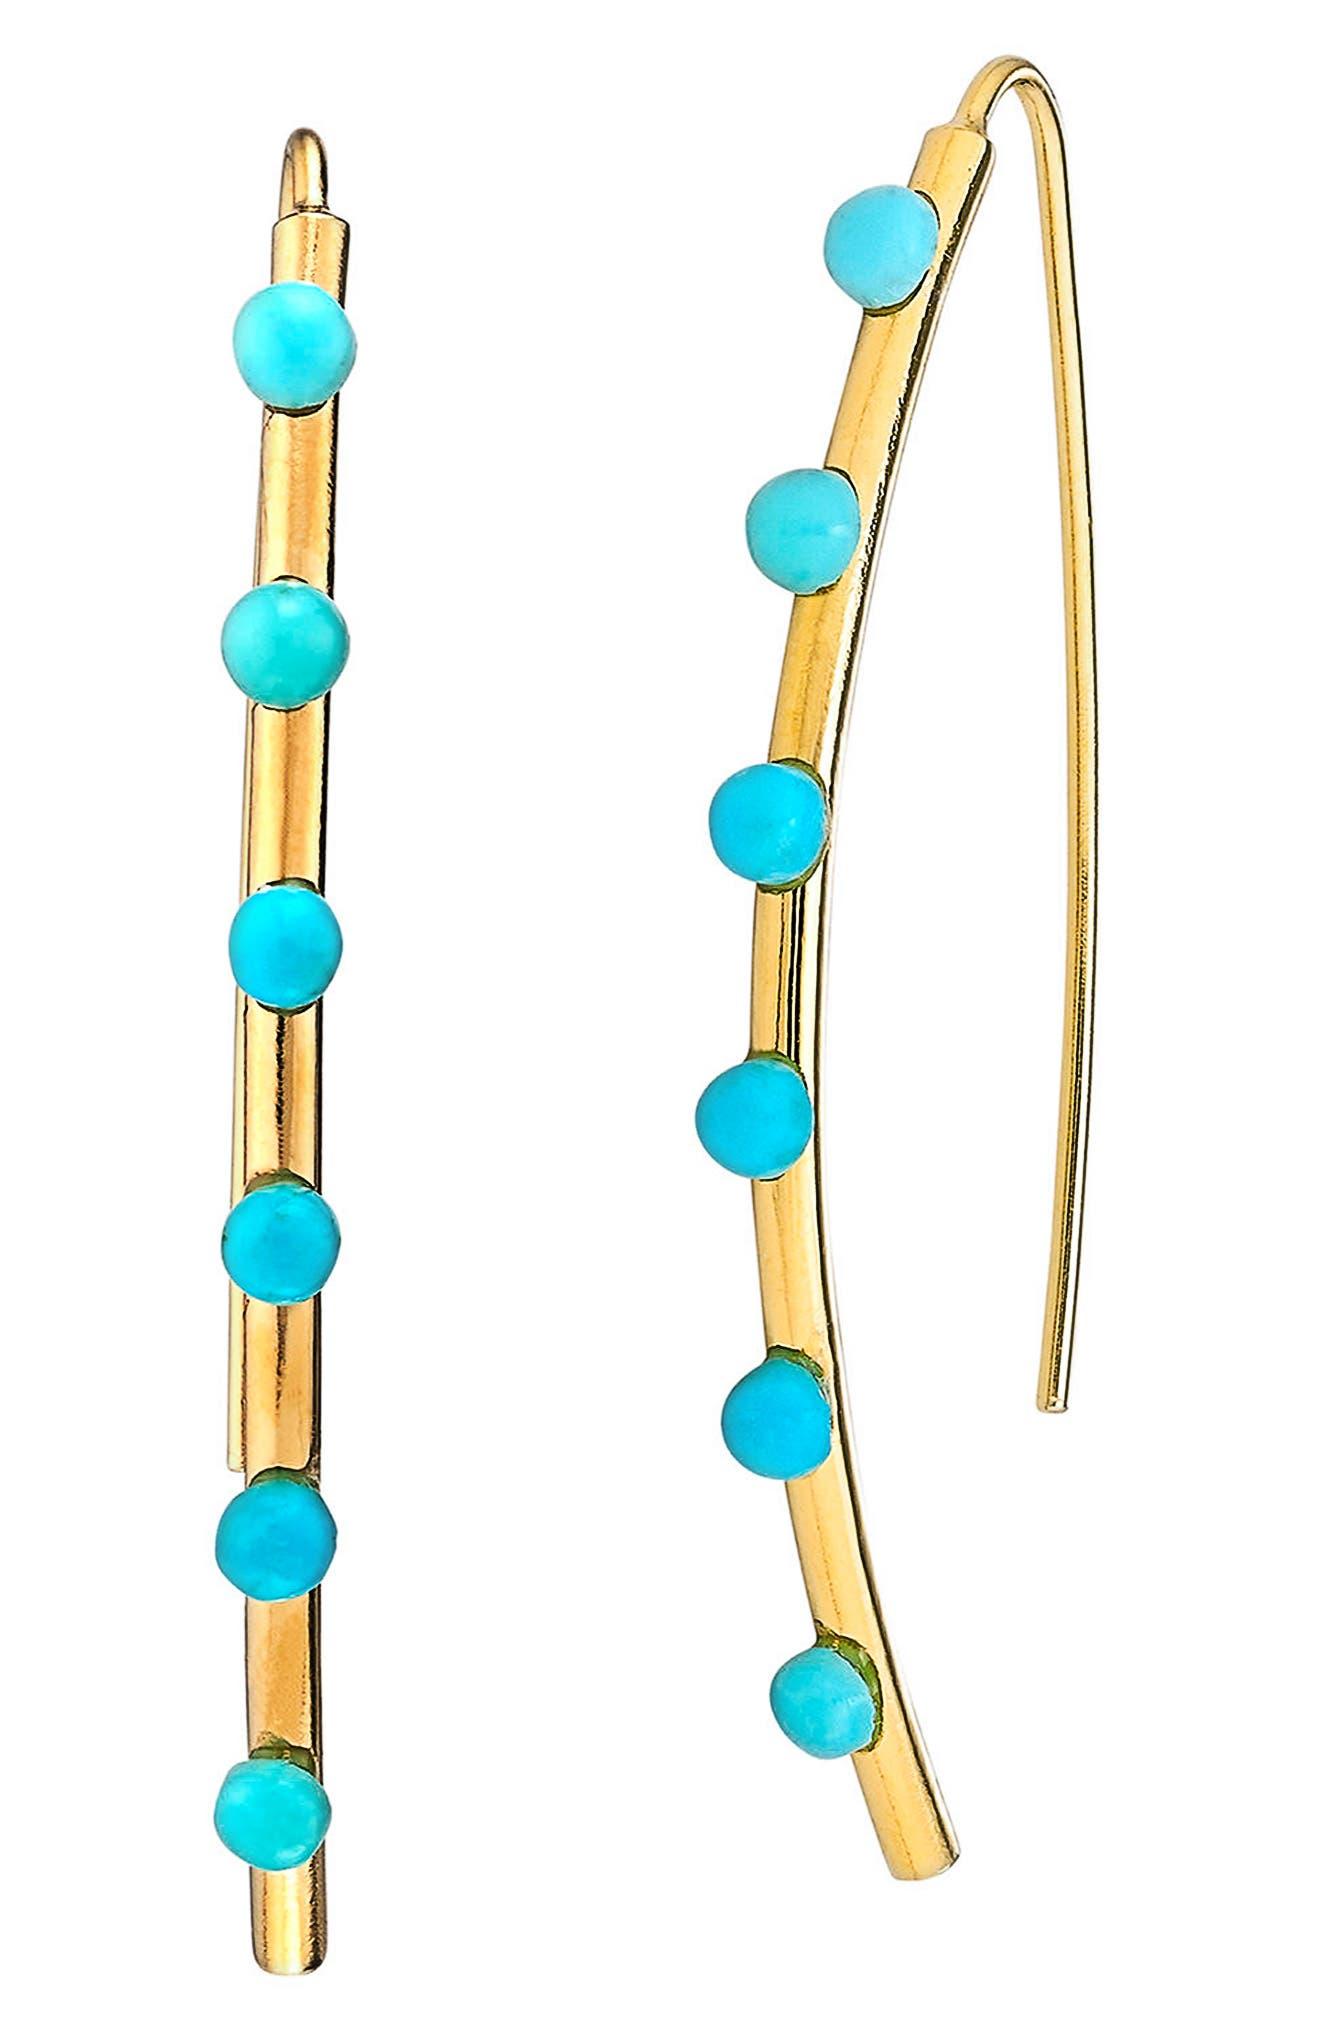 Emilia Small Earrings,                             Main thumbnail 1, color,                             Turquoise